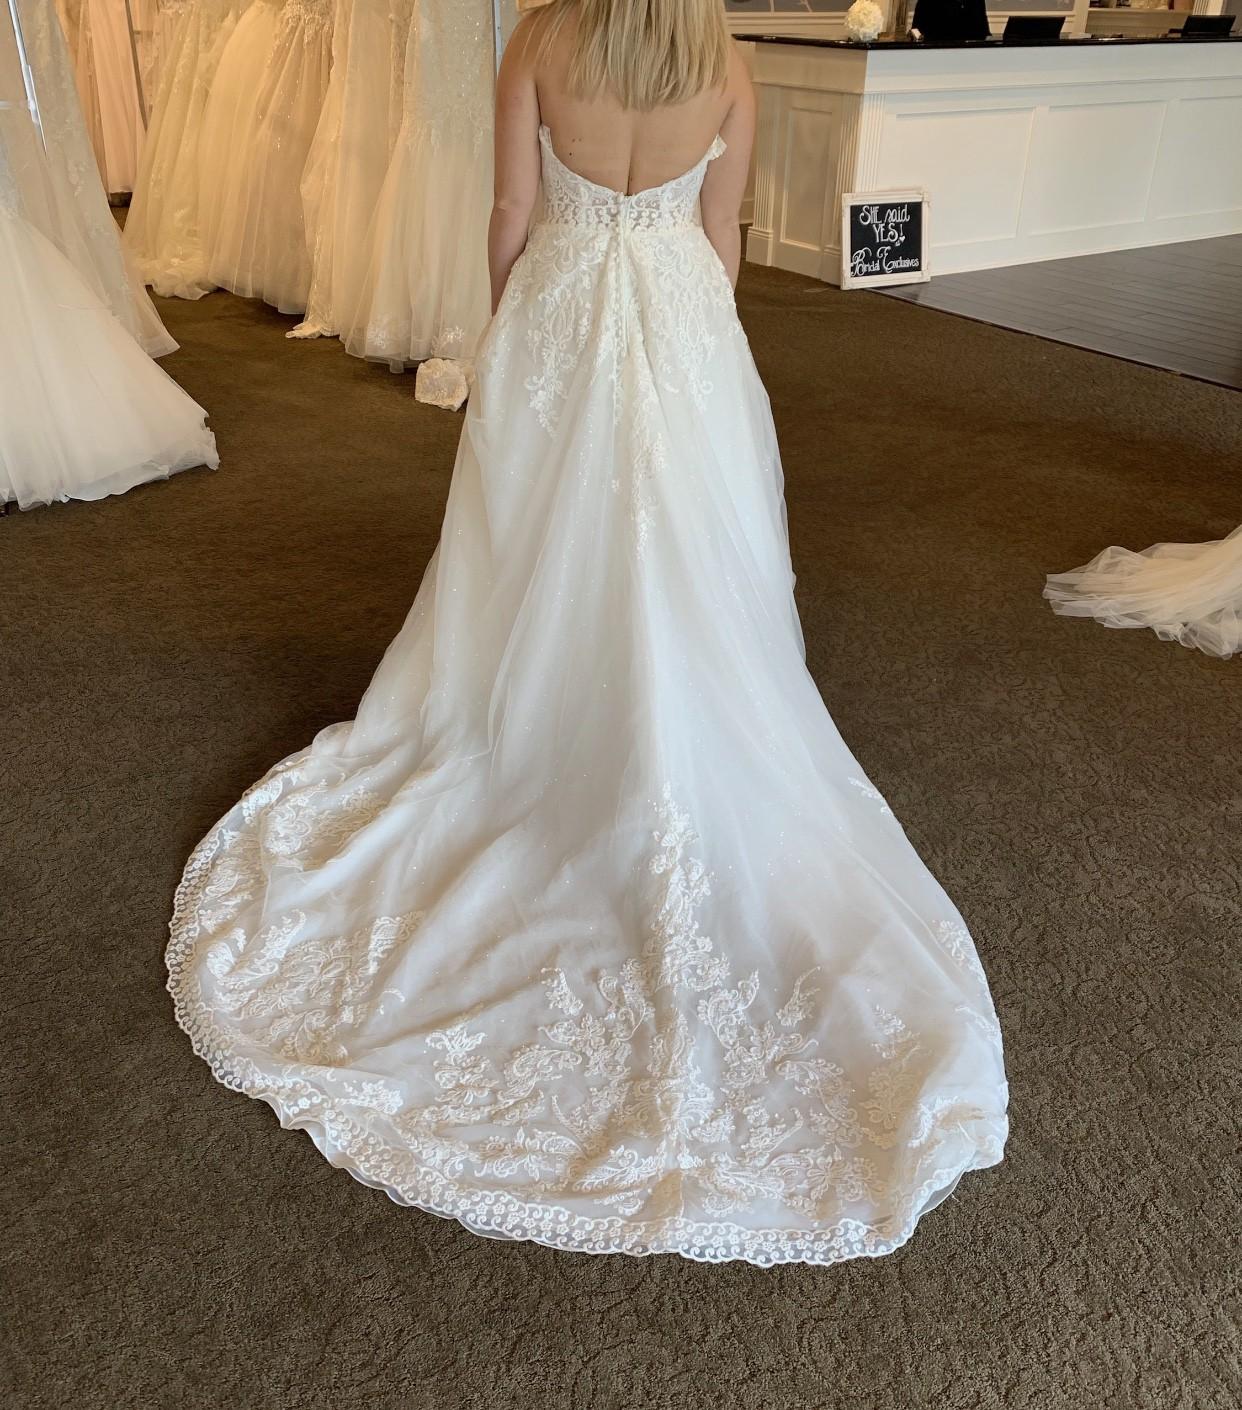 Morilee New Wedding Dress On Sale 29% Off